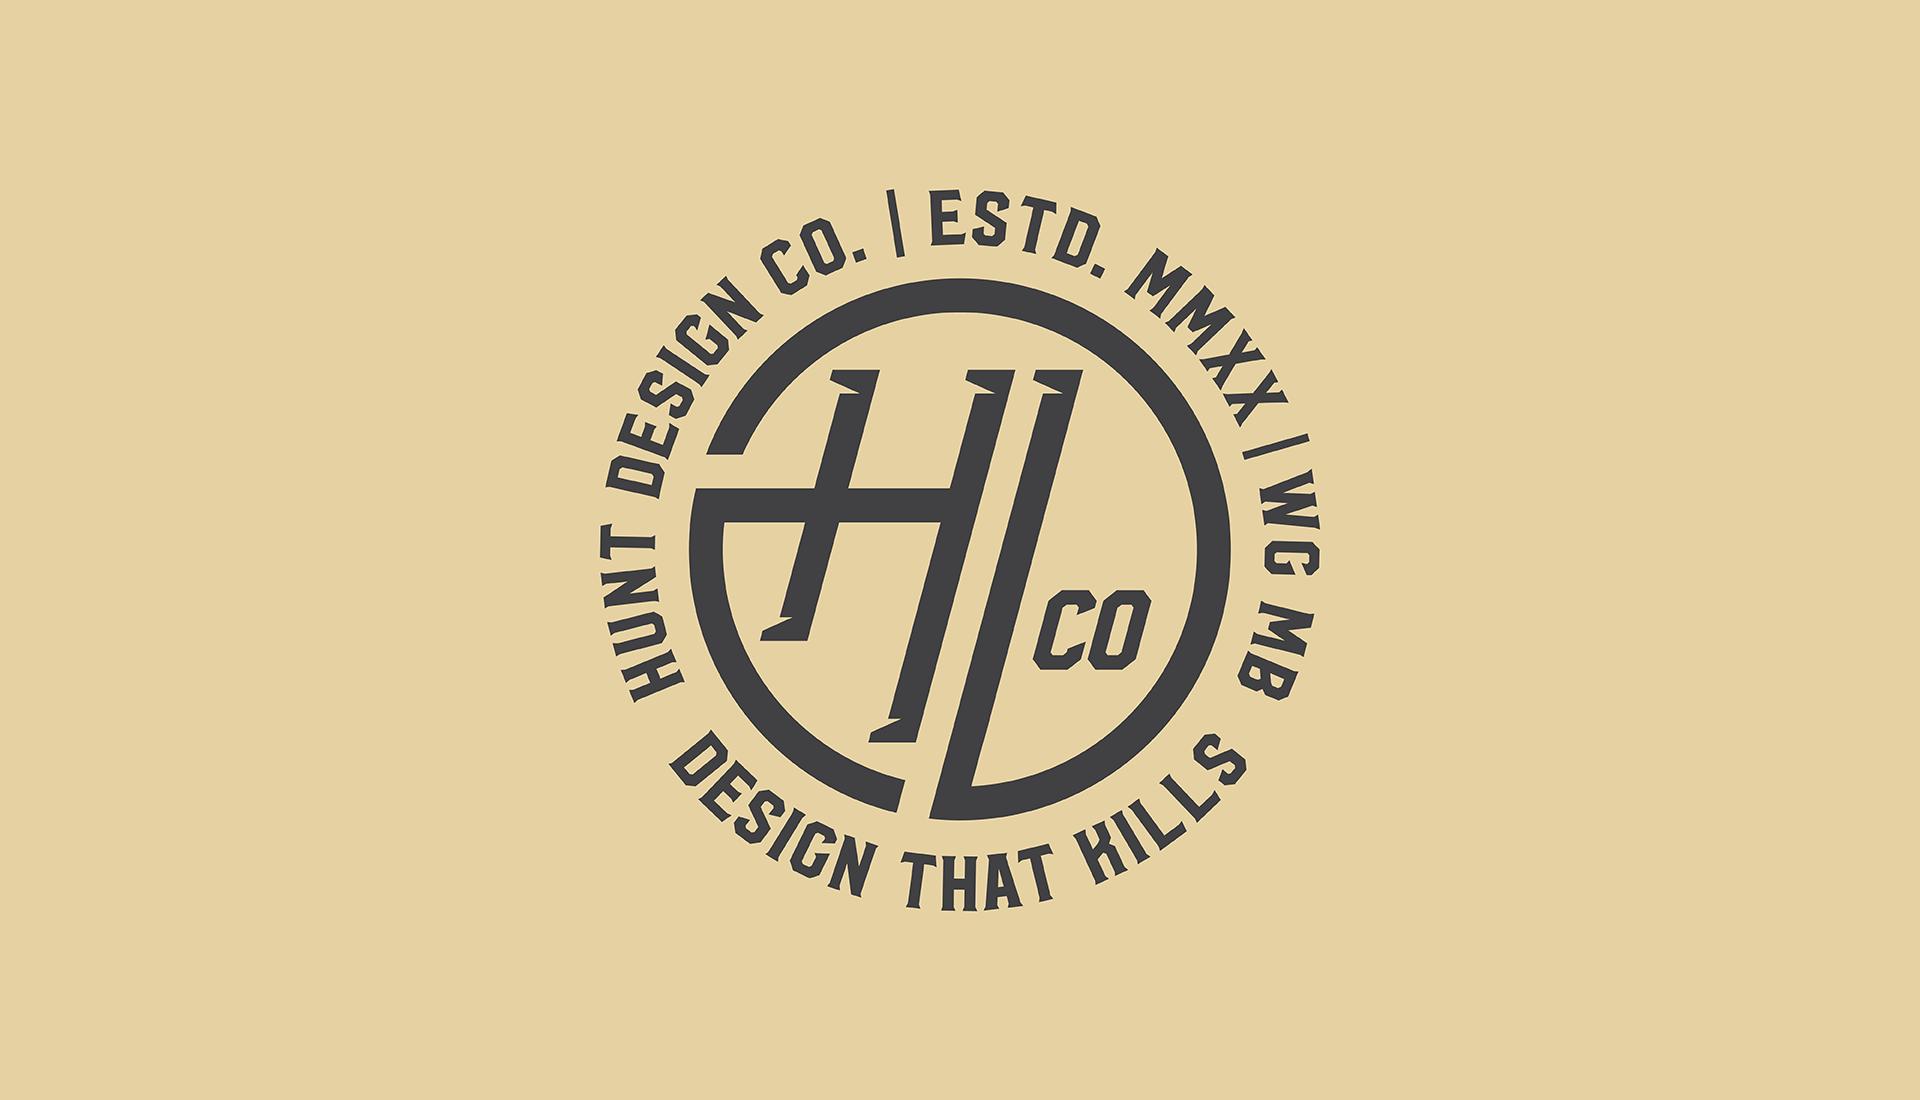 Hunt Design Co.   Secondary Logo, Circular Badge, Esdt. MMXX, Winnieg, Manitoba, Design that kills